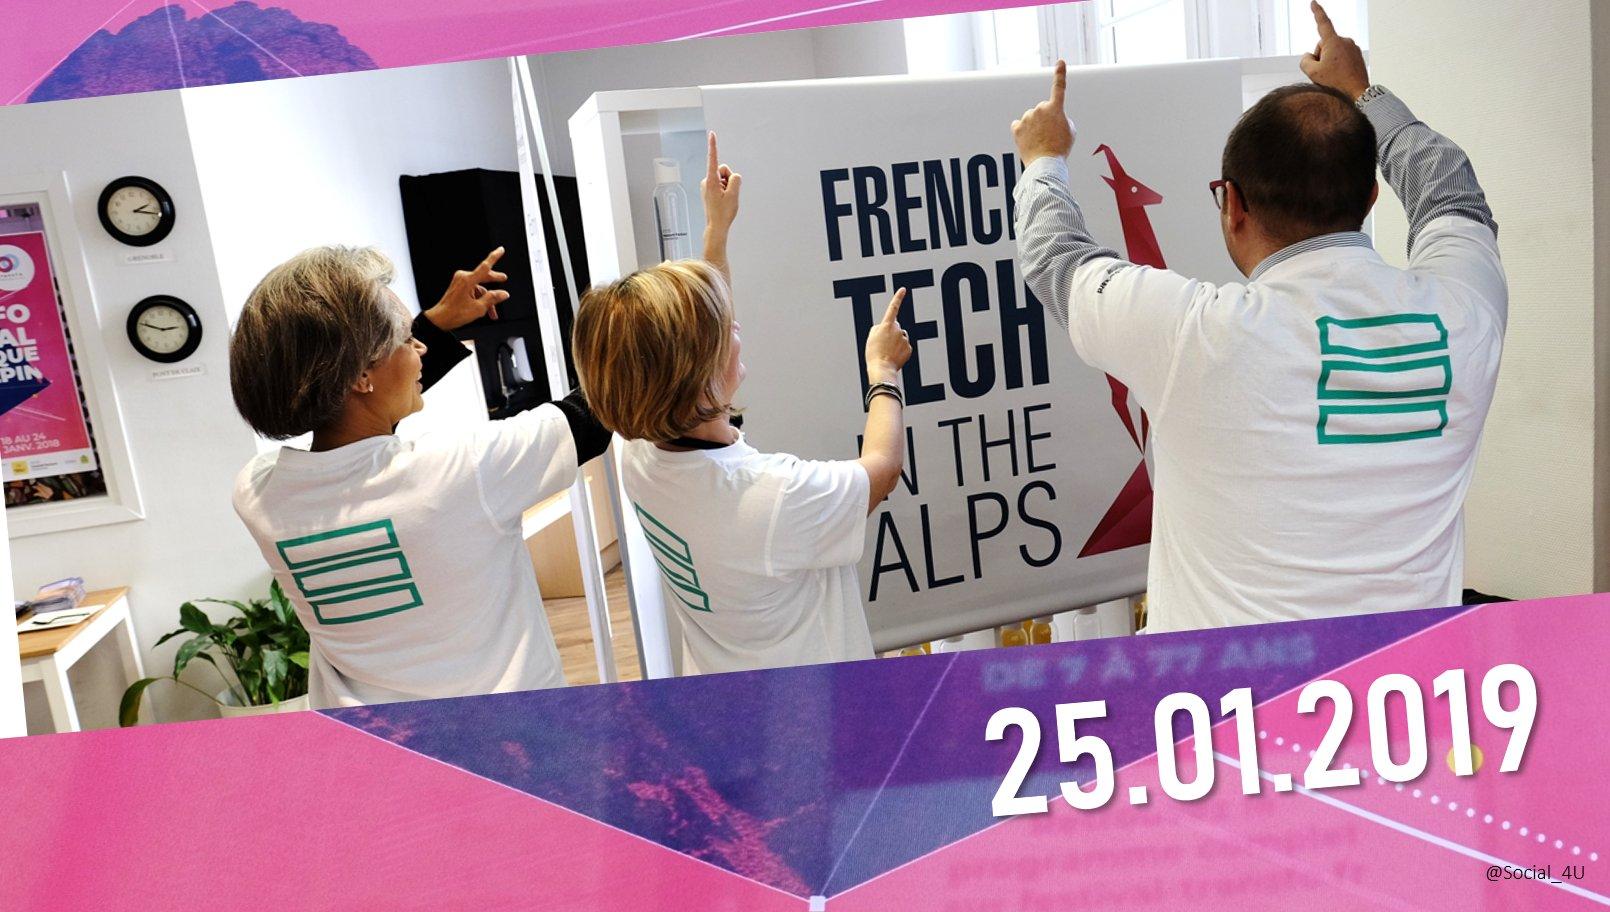 Placeholder: #HPE will be at @FestivalTransfo Jan 25, 2019 ! #IoT & #AI Program is cooking with many #Enterprises & #StartUps @FTAlpsGrenoble @AnnecyFTech @MilkshakeValley @Rase_phil @GrenobleAngels @Minalogic_EN @LaCasemate @LaFrenchTech… #HPEDiscover #HPEStartUpFR #FrenchTech https://t.co/ngbLS5iMik